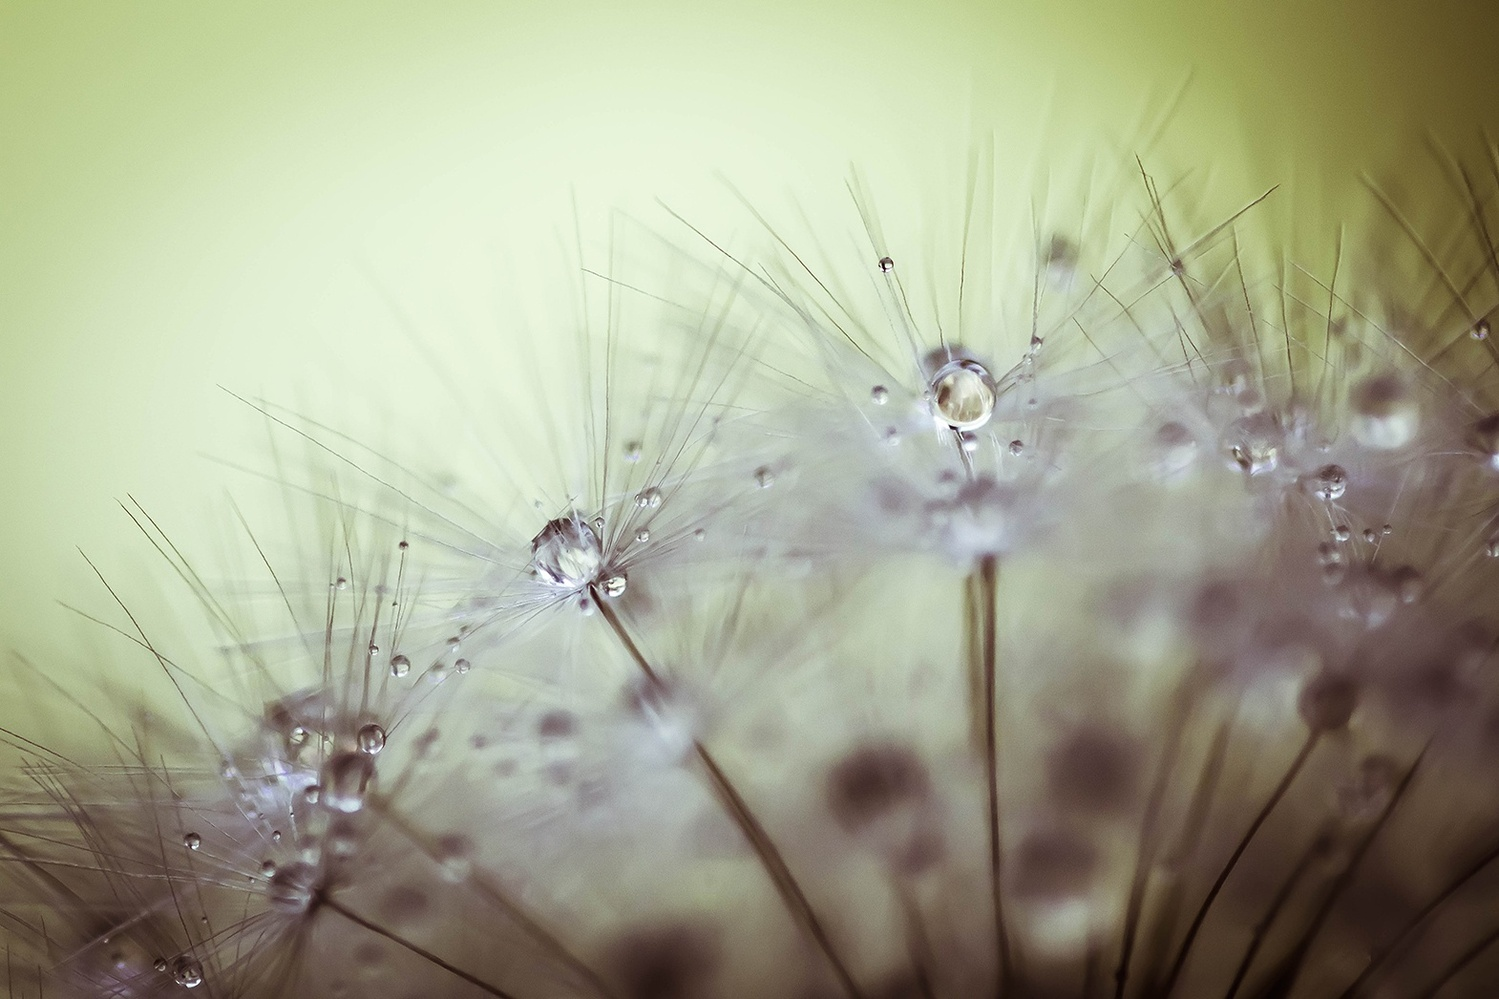 Dandelion Spread by Novak Miler